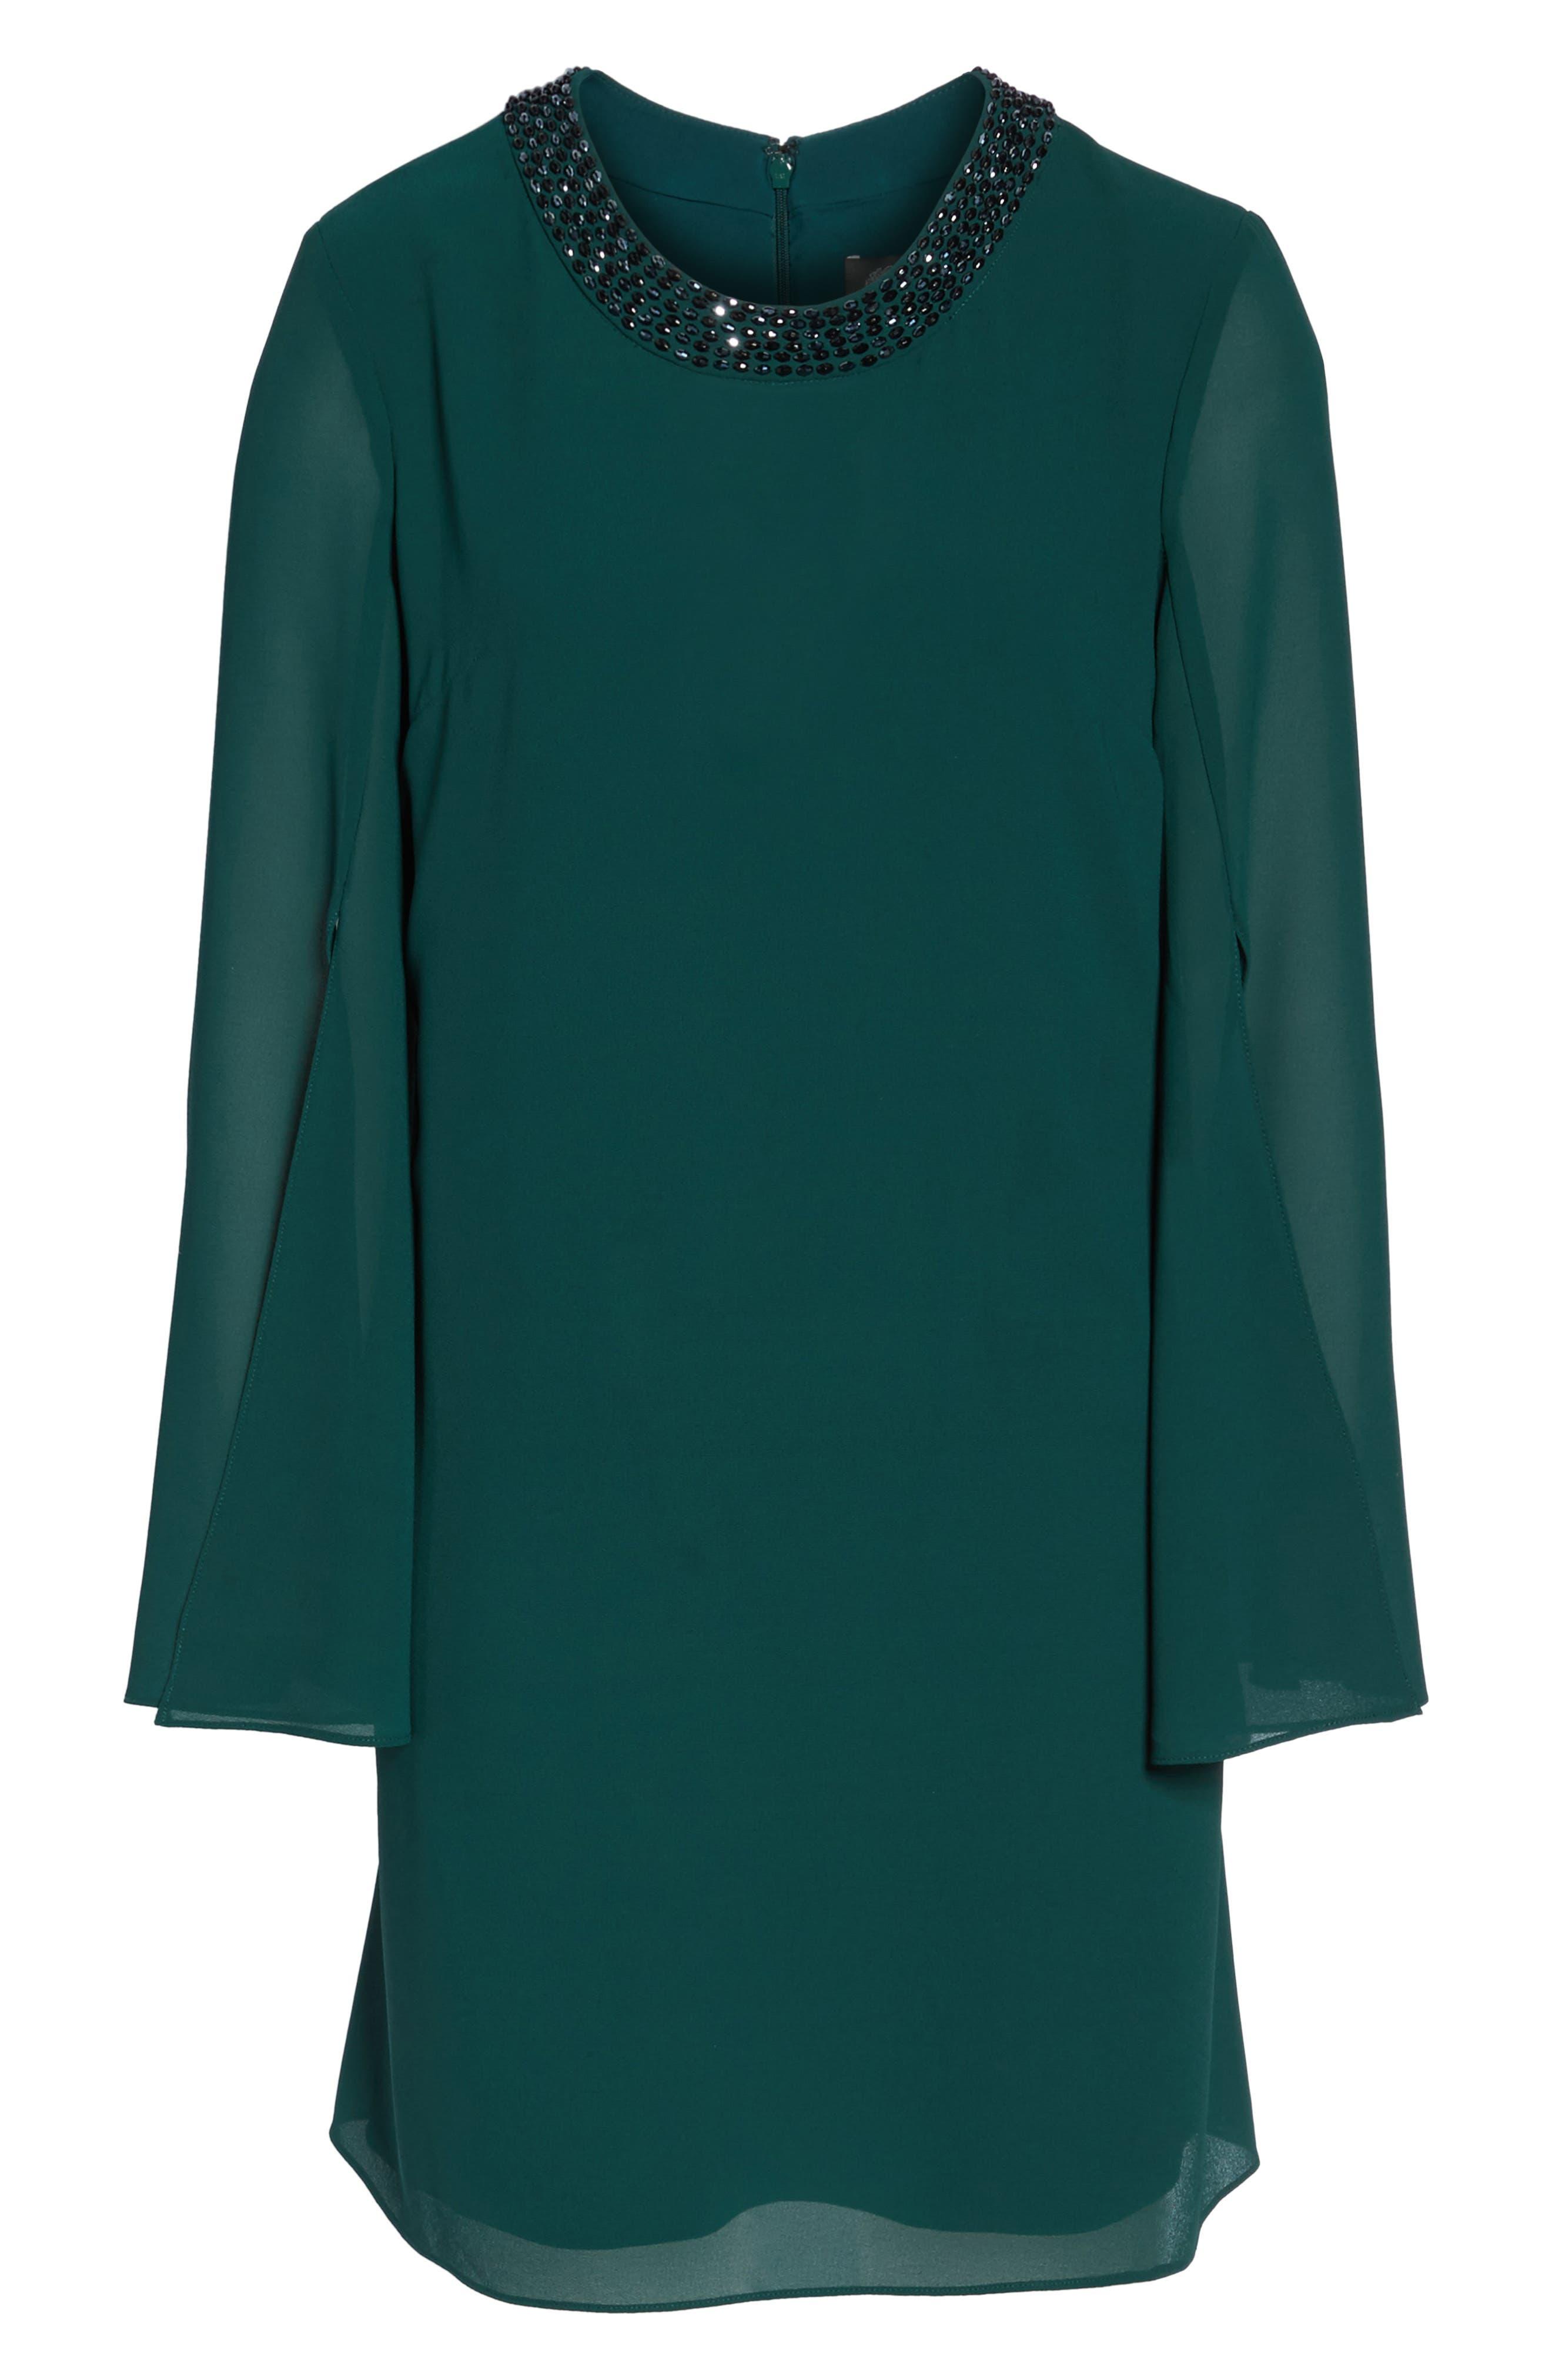 Embellished Chiffon Shift Dress,                             Alternate thumbnail 6, color,                             302